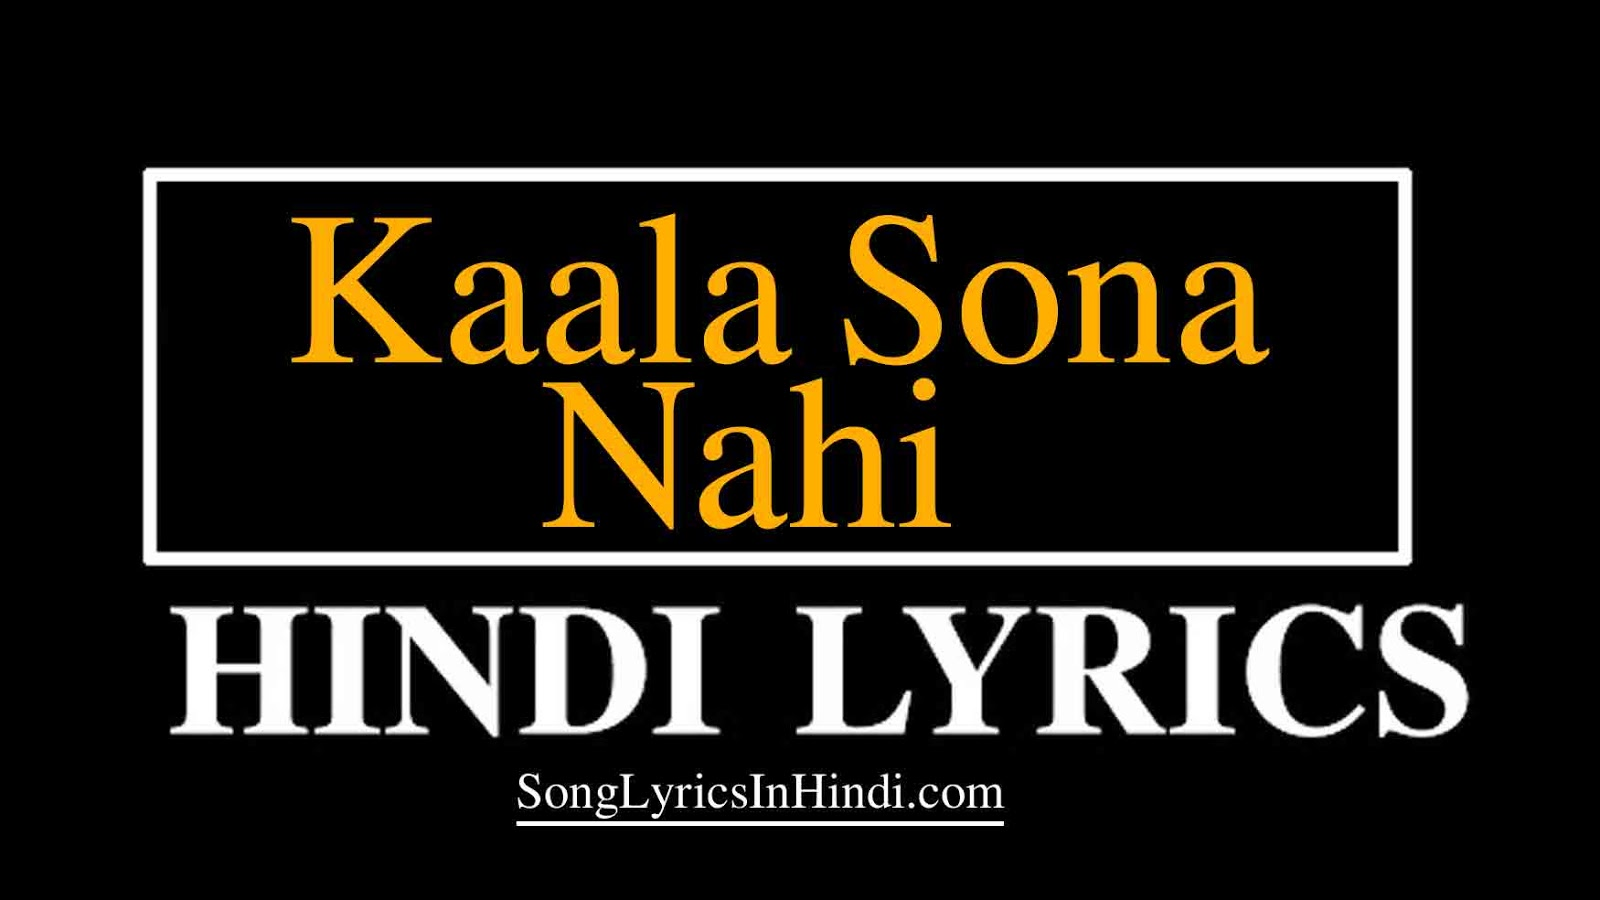 Kaala Sona Nahi Akhil Hindi Lyrics | कल्ला सोहणा नैइ | Tu Kalla Sohna Nahi Akhil Lyrics | Kala sohna nai